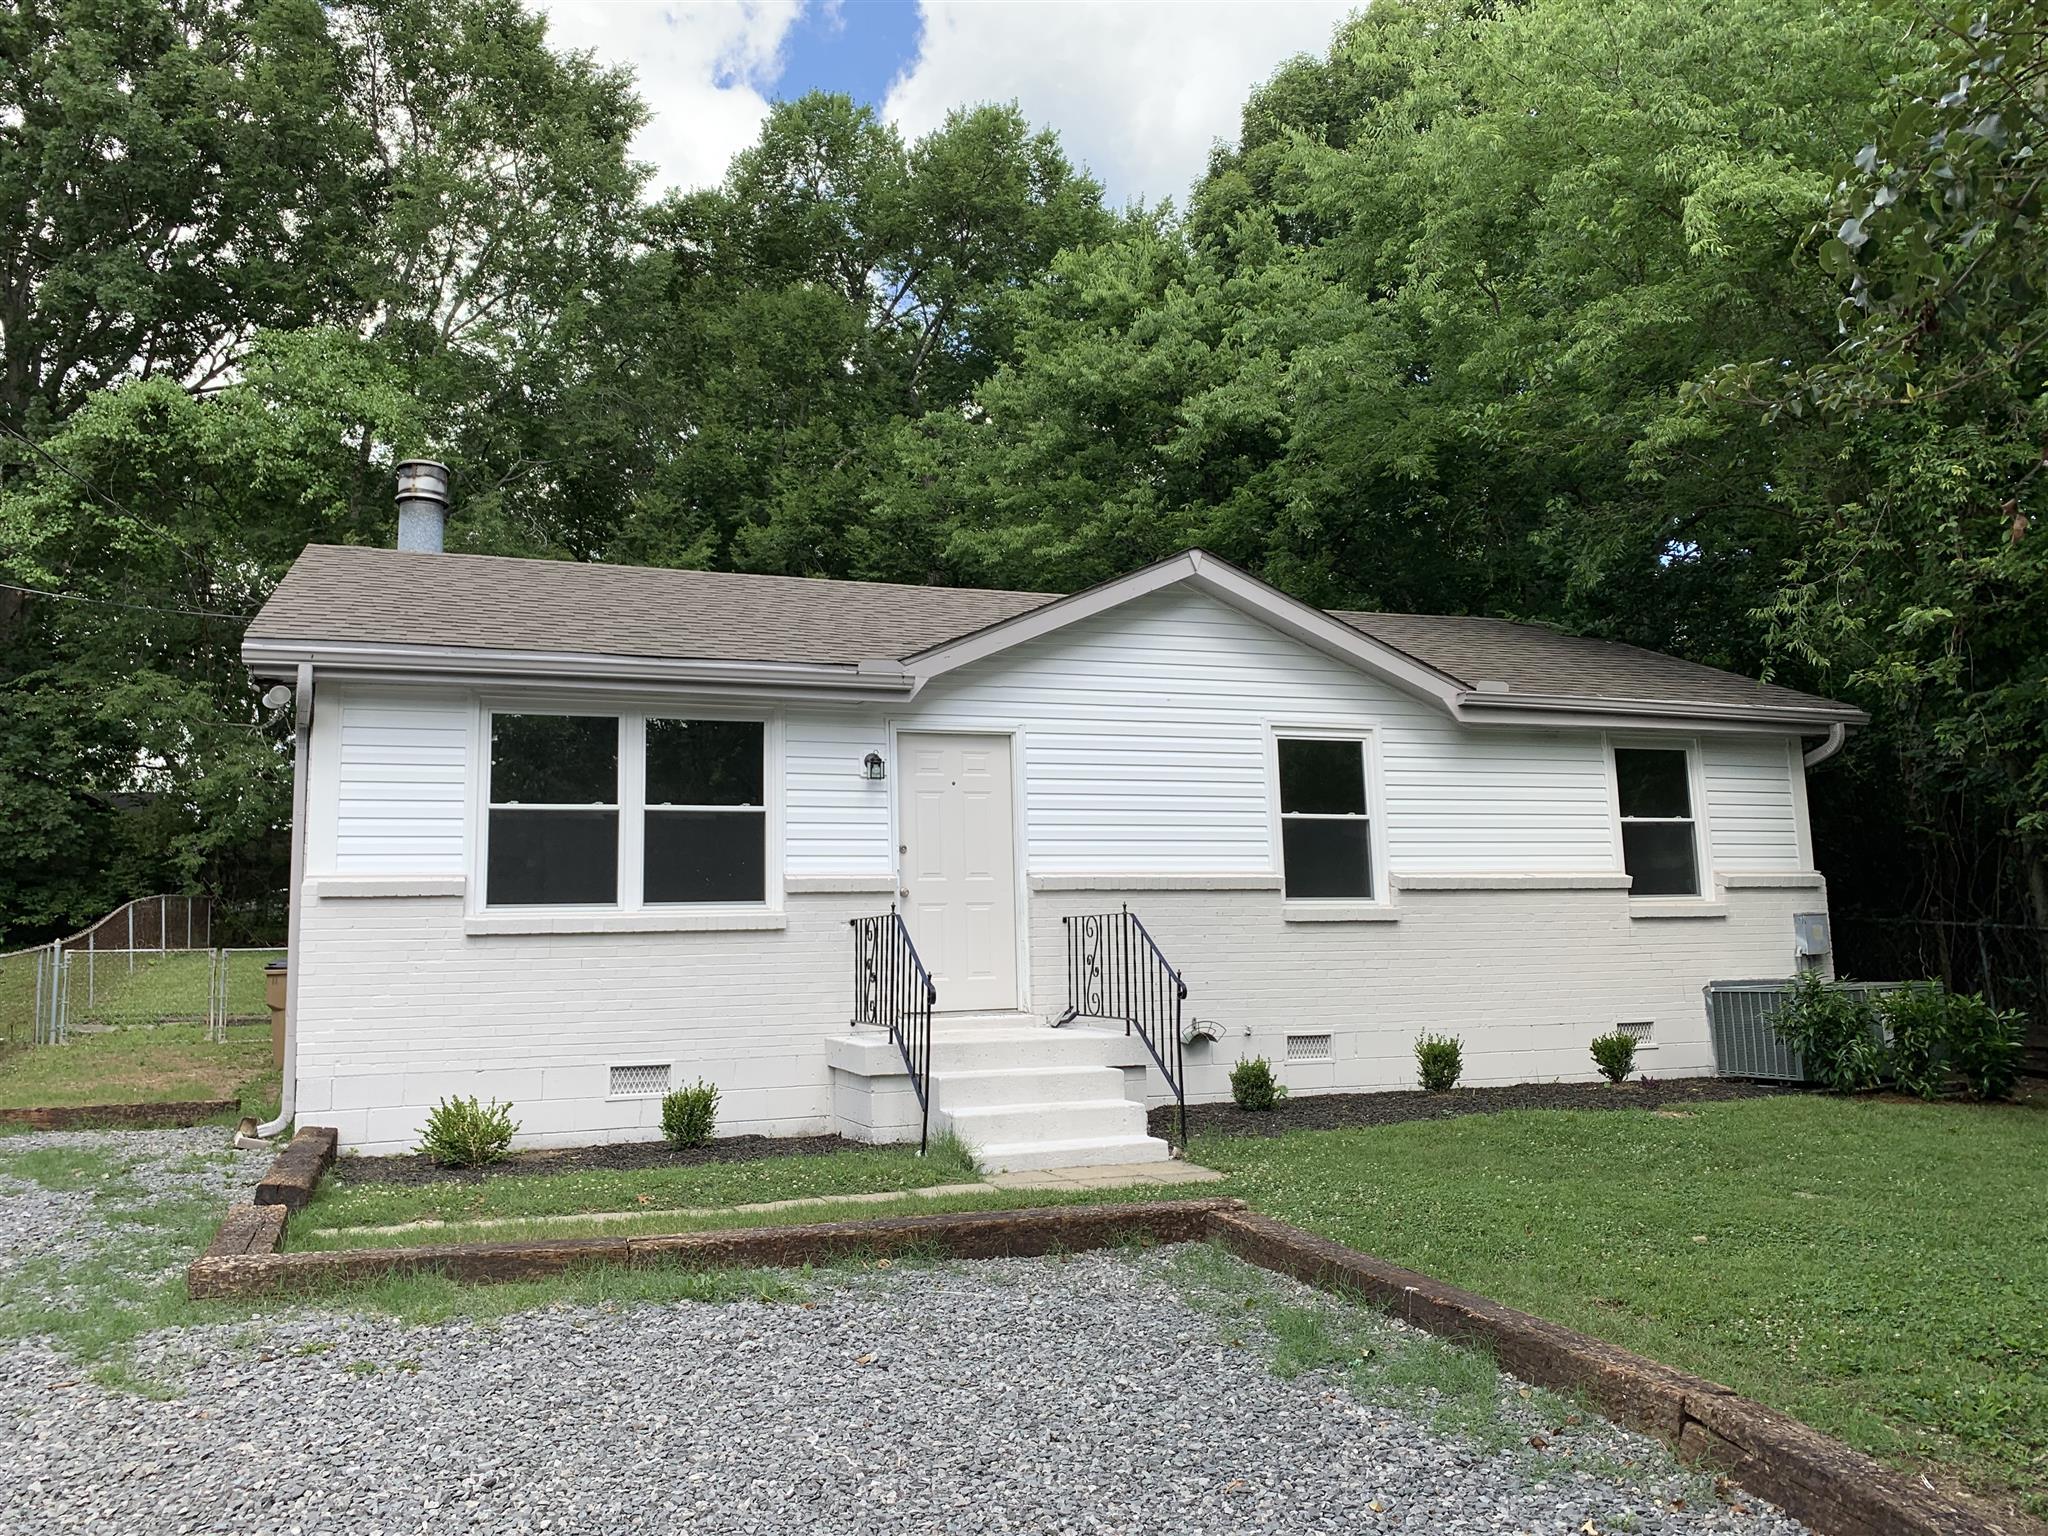 643 Bixler Ave, Madison, TN 37115 - Madison, TN real estate listing